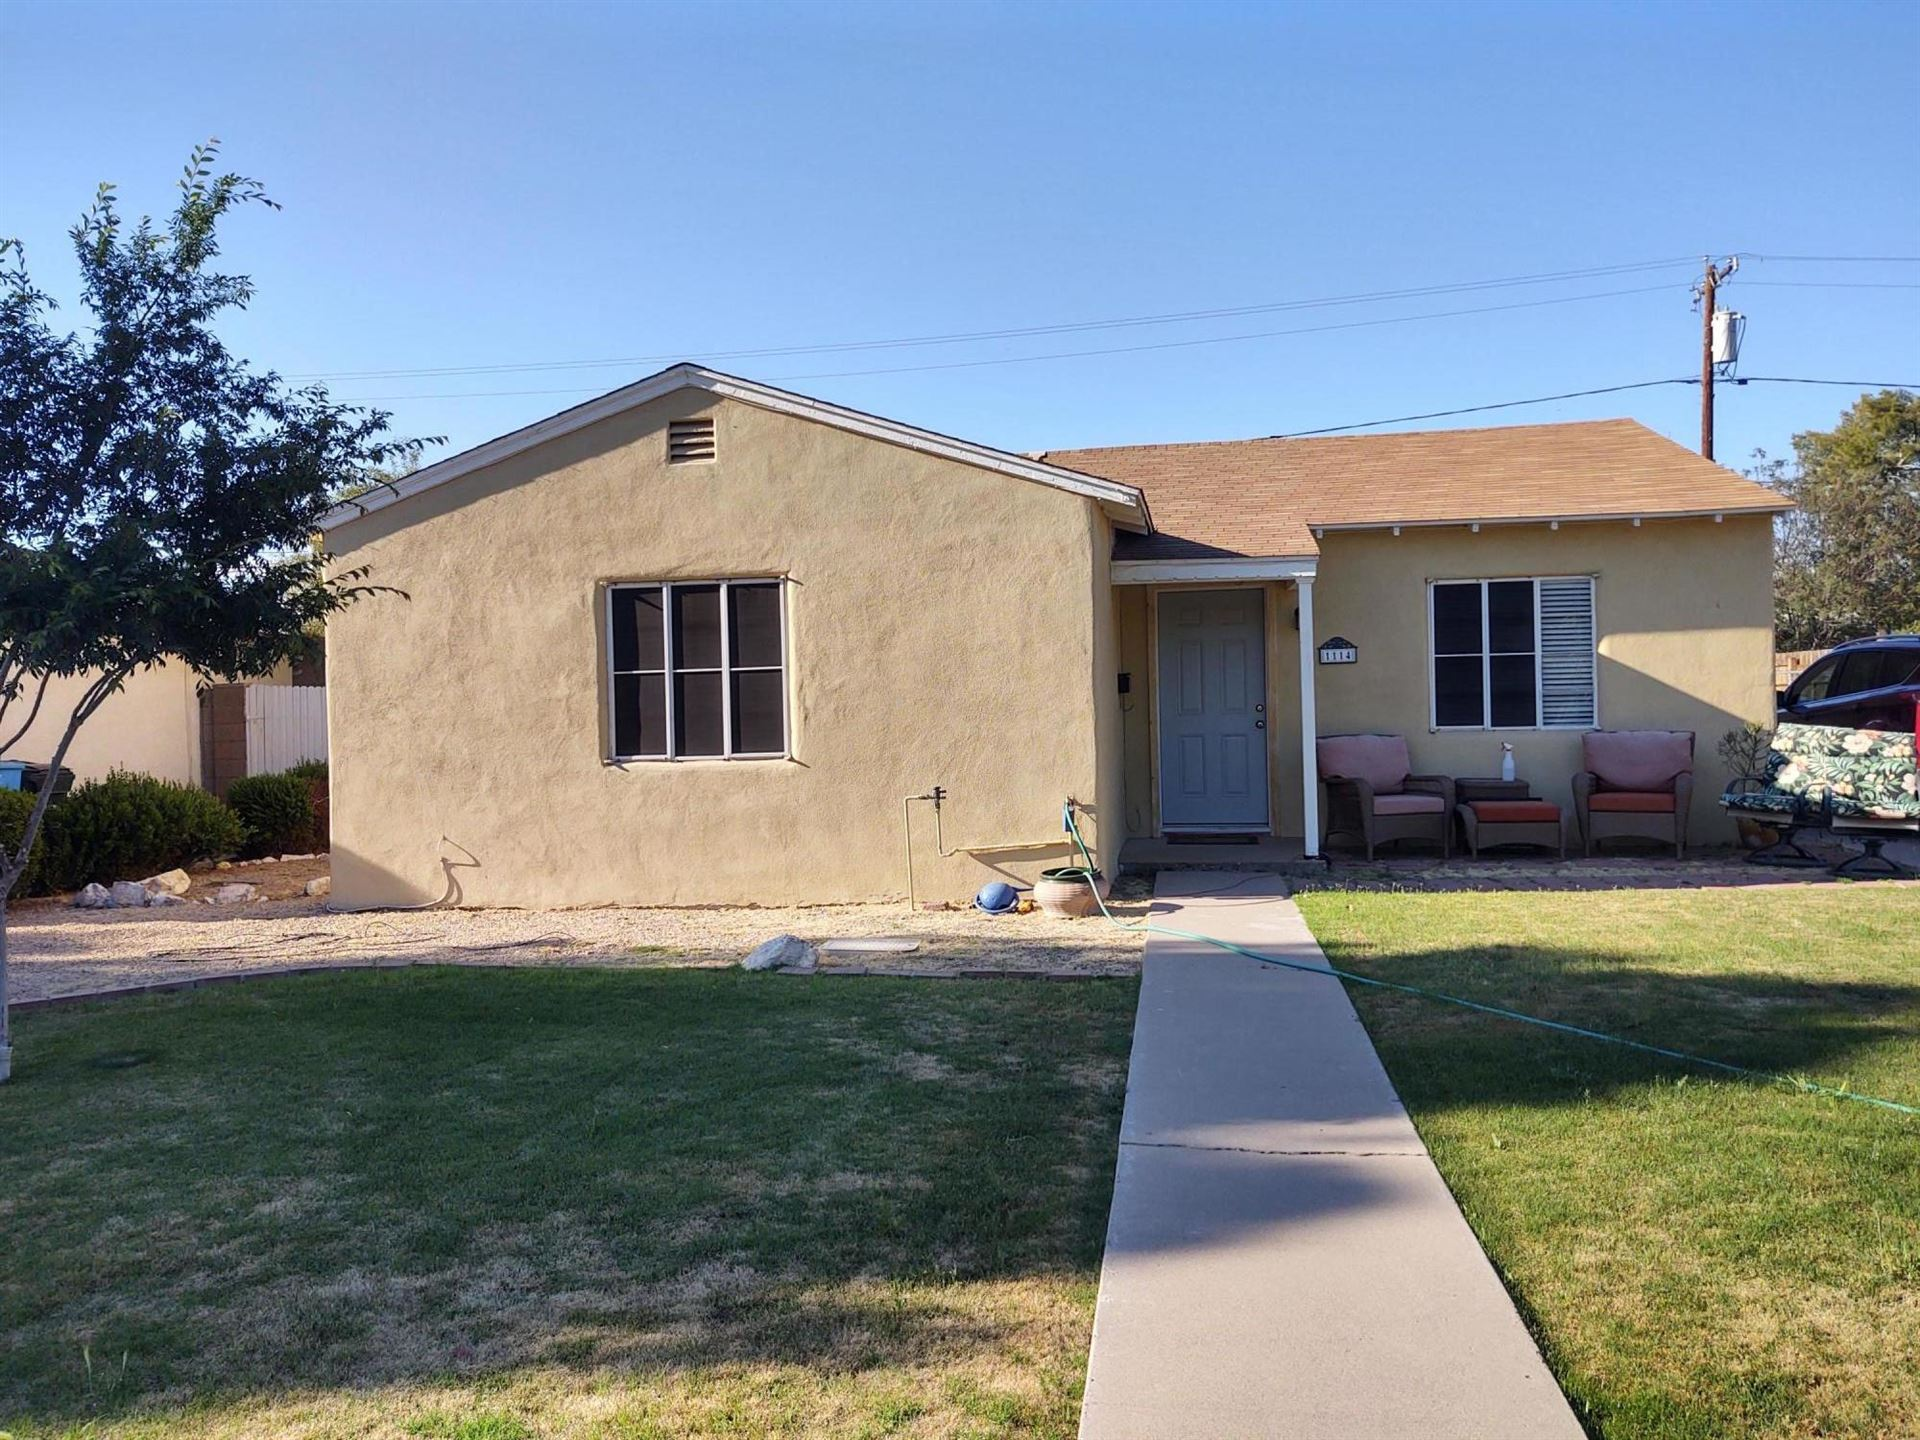 1114 W GLENROSA Avenue, Phoenix, AZ 85013 - MLS#: 6218291